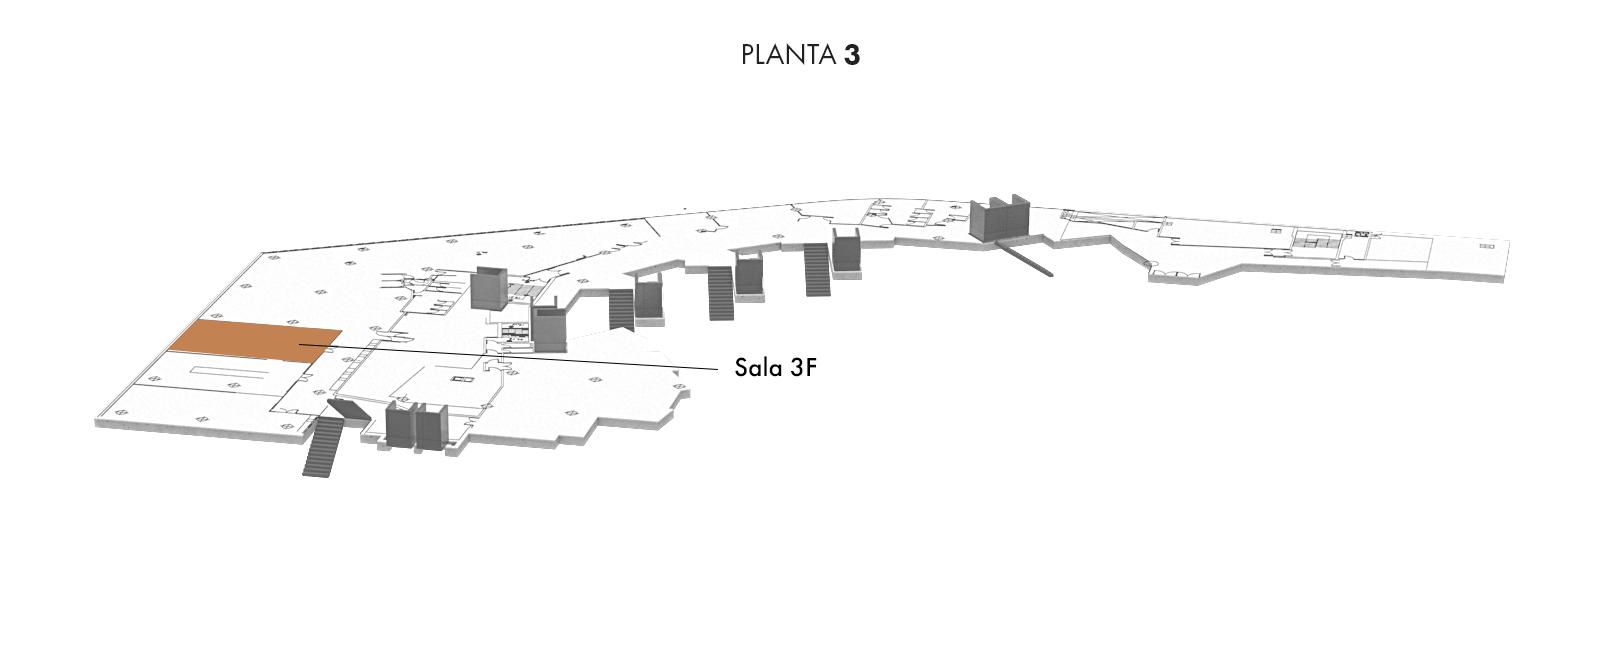 Sala 3F, Planta 3   Palacio Euskalduna Jauregia